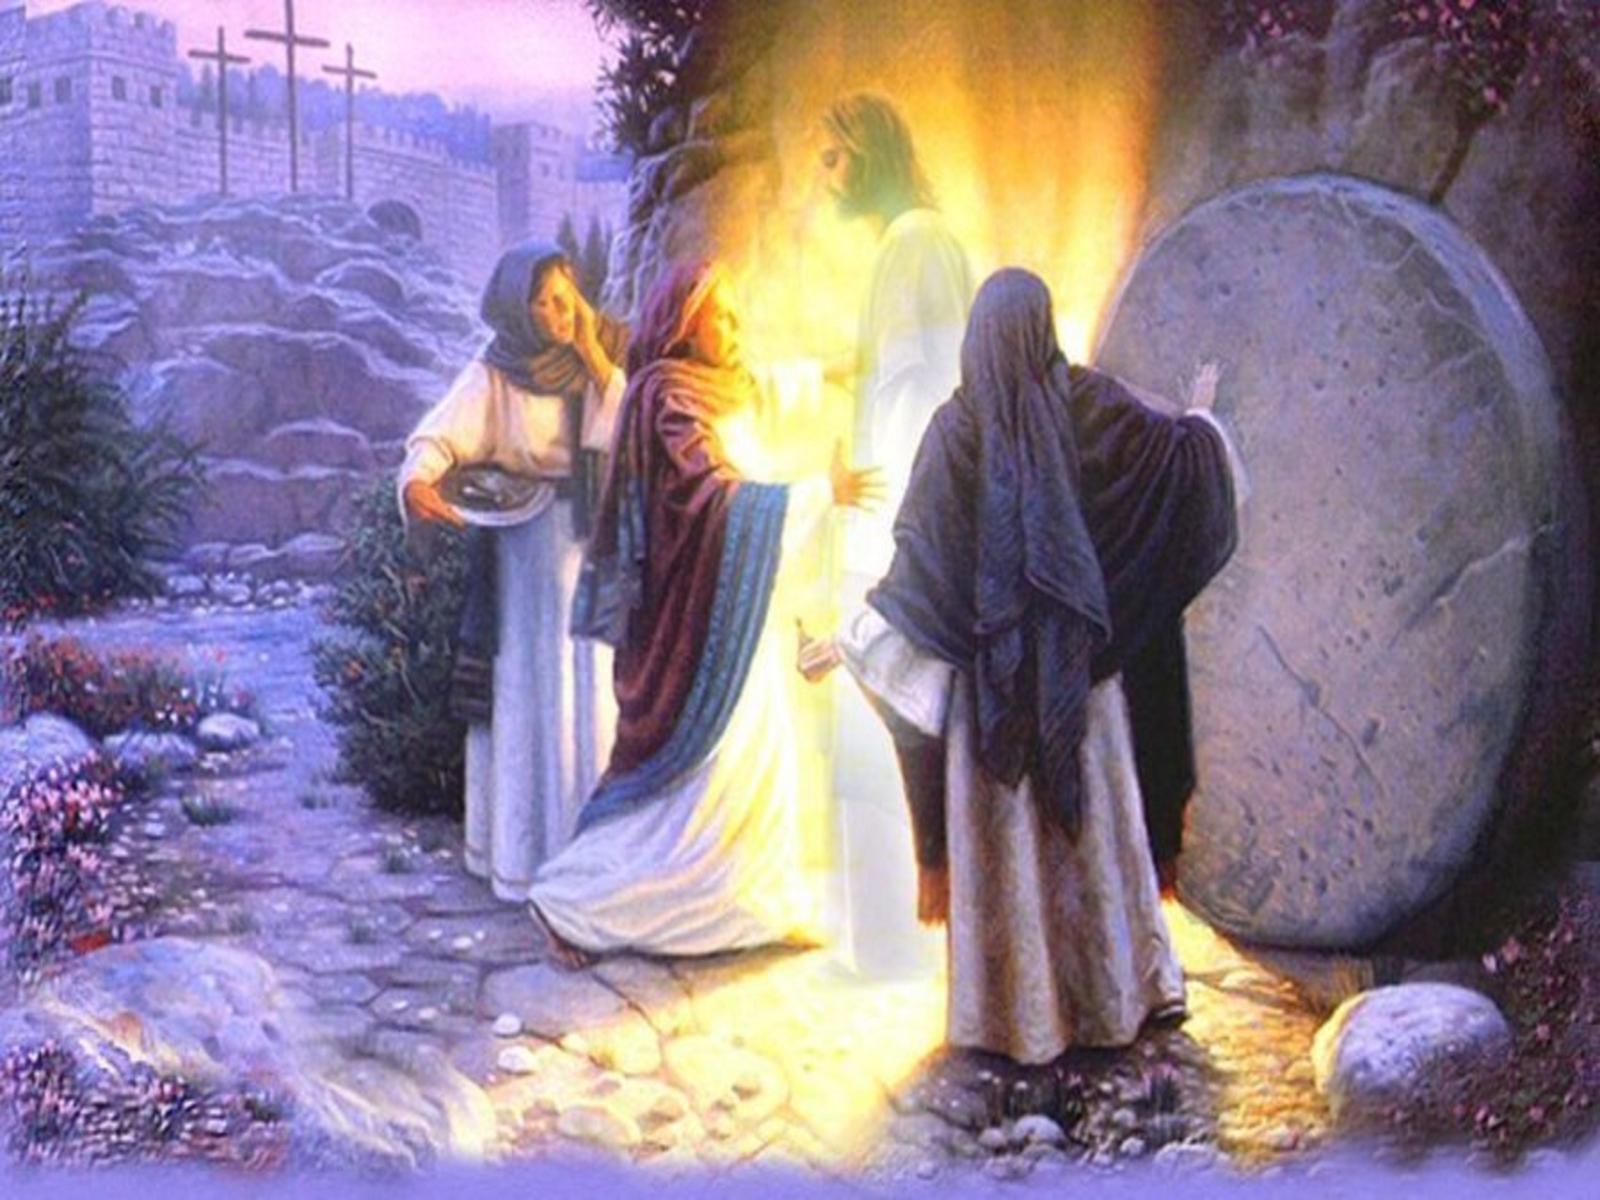 resurrection of jesus christmyjavier007 on deviantart | keepers